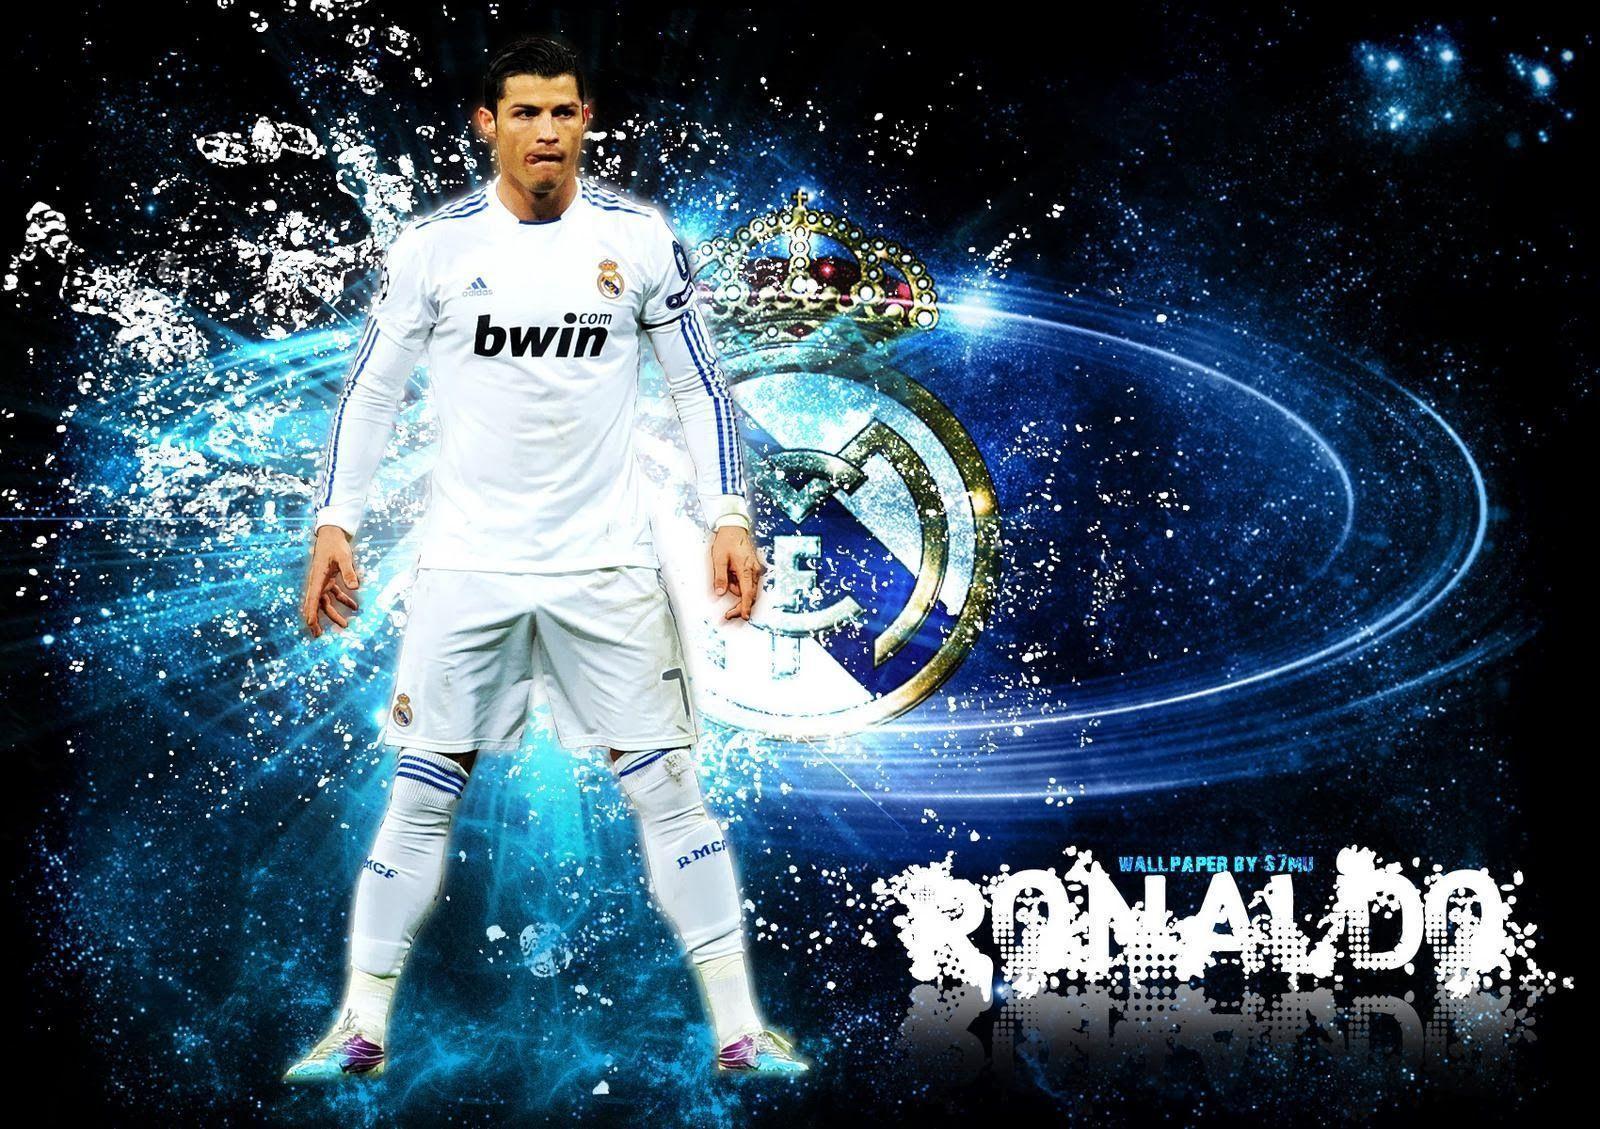 ronaldo football wallpapers hd - photo #29